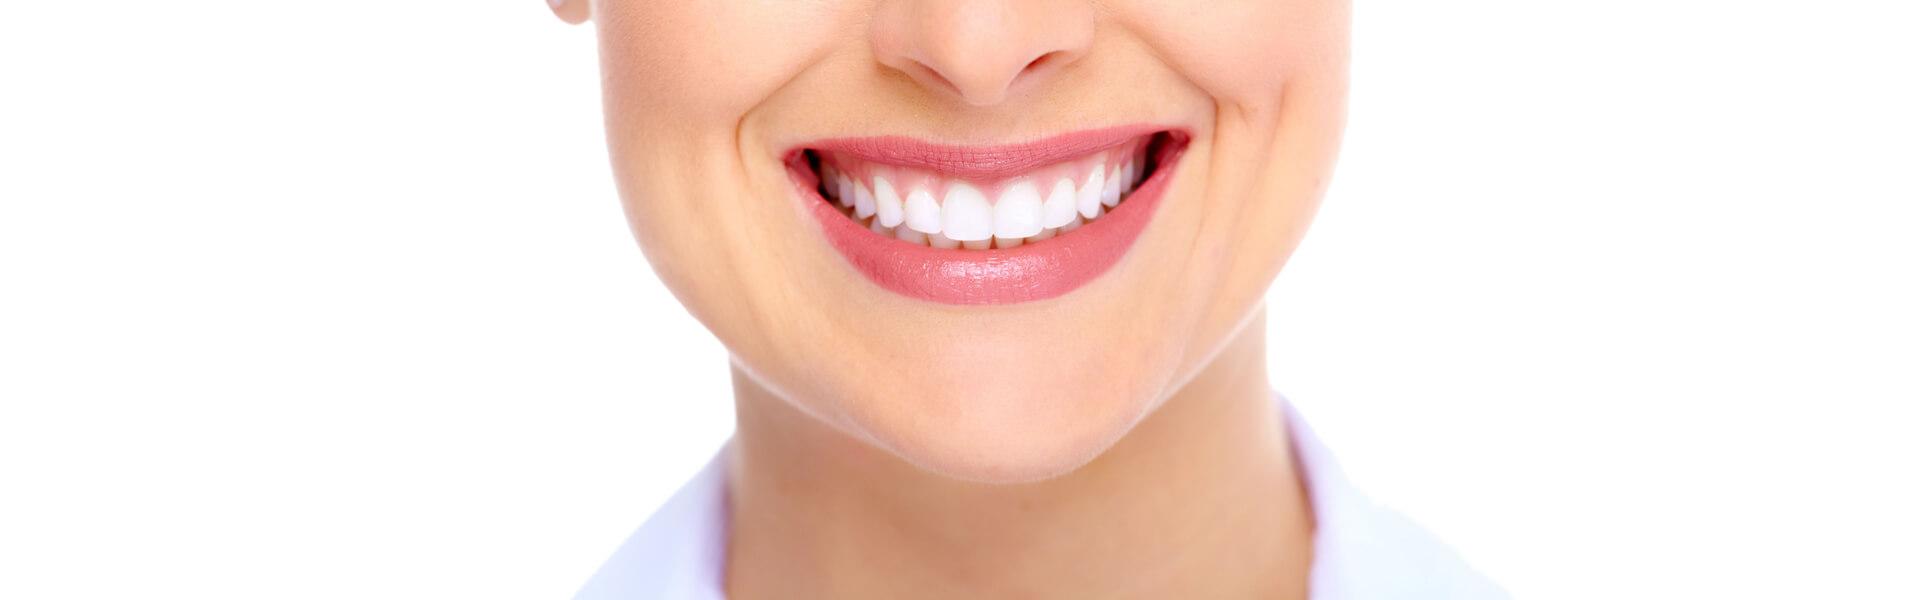 Dental Bridge Vs. Dental Implant: Which Option Would You Prefer?